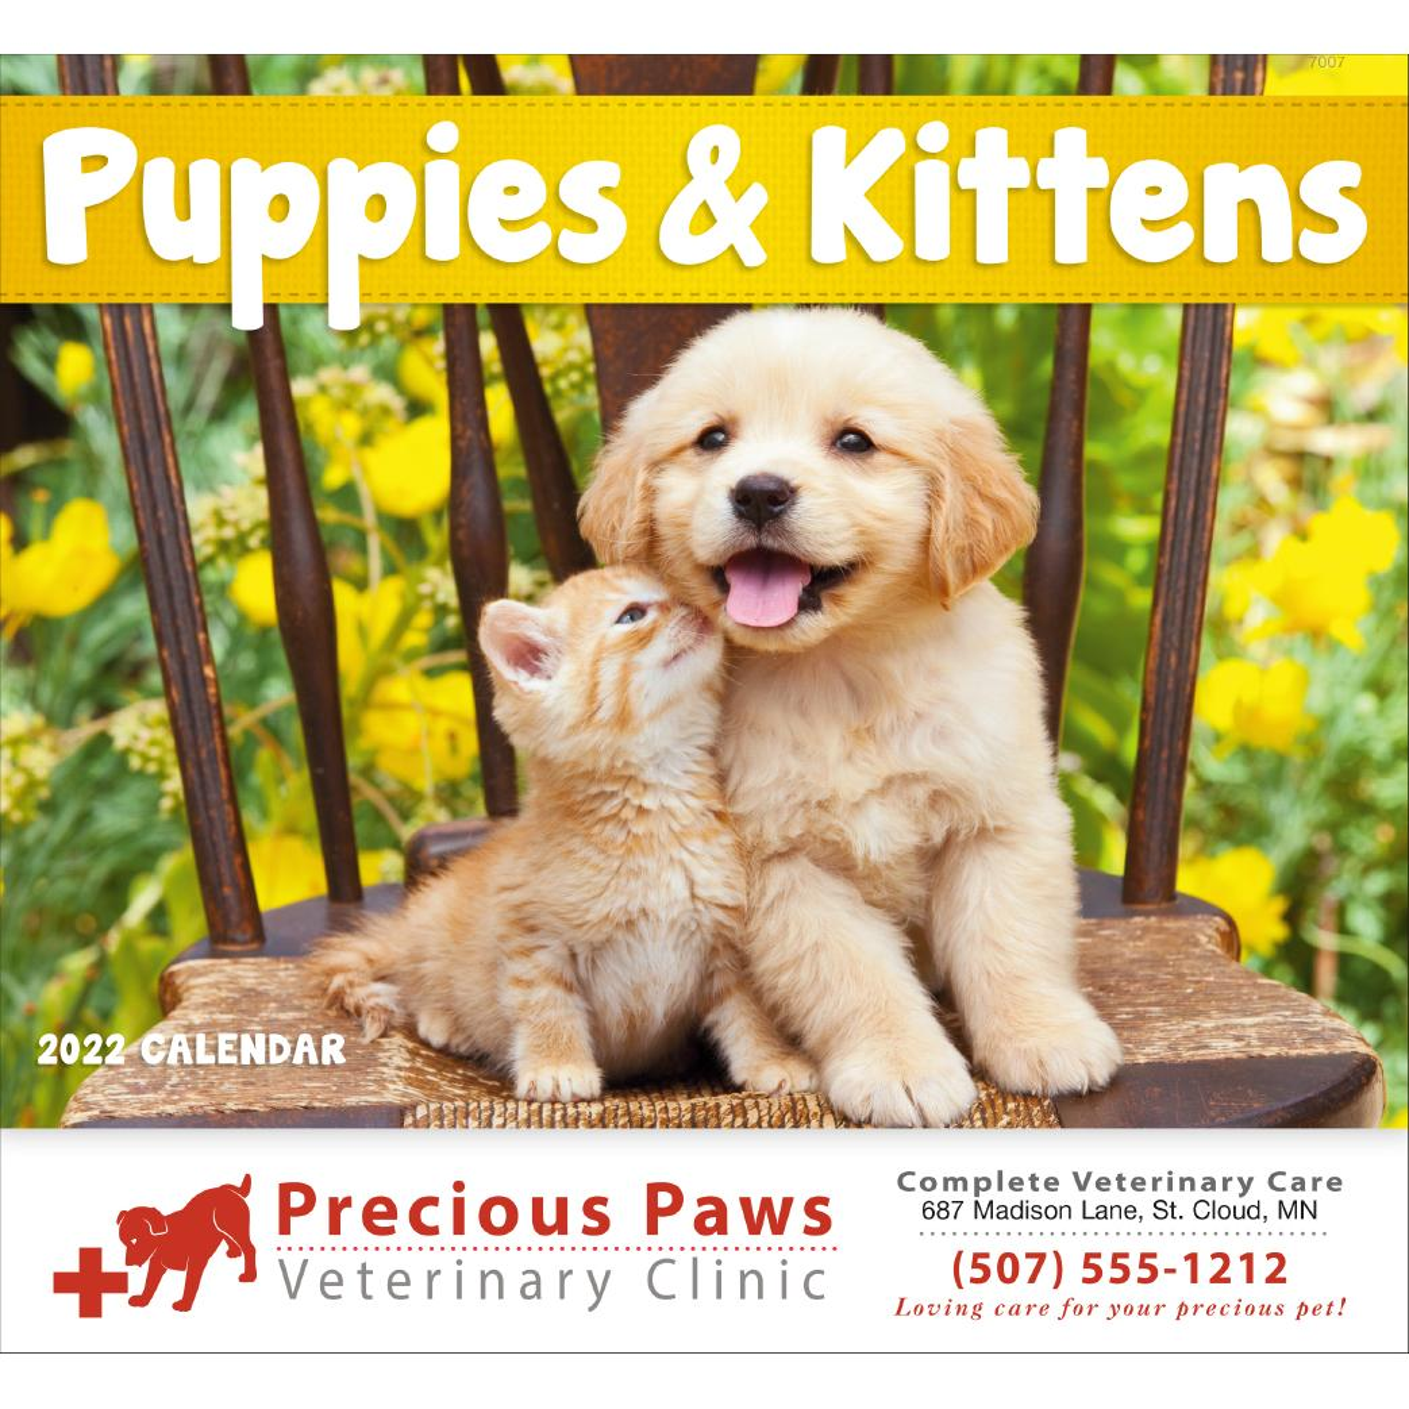 Printable Calendar 2020 Kitten December CLICK HERE to Order 2020 Puppies and Kittens Stapled Calendars